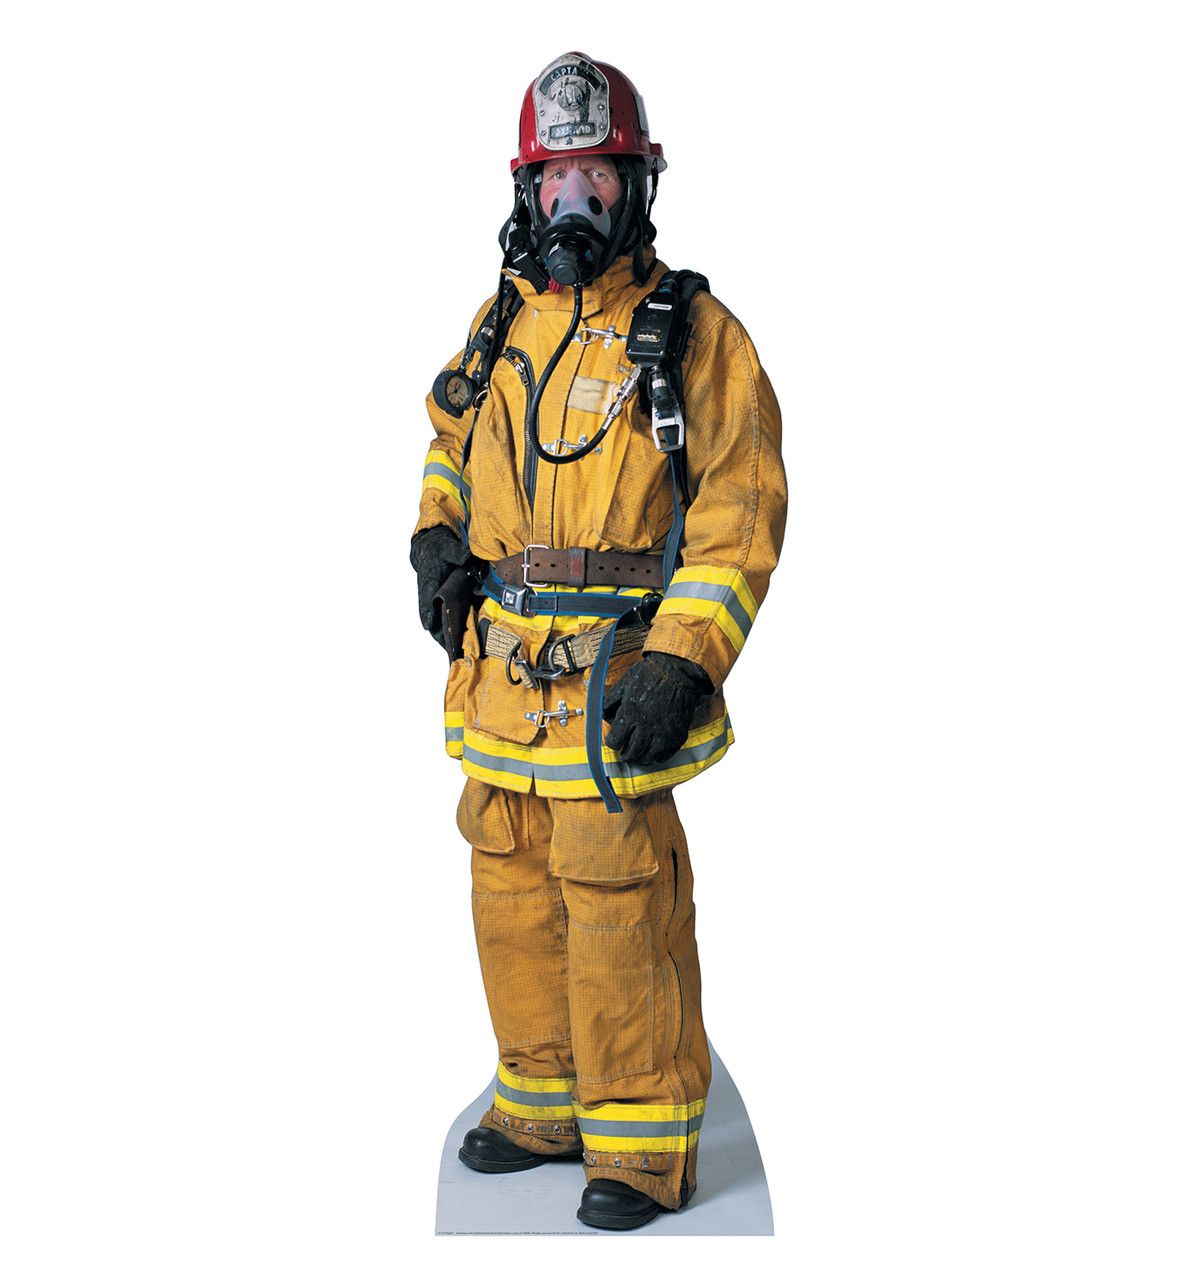 Life-size Firefighter Cardboard Standup | Cardboard Cutout